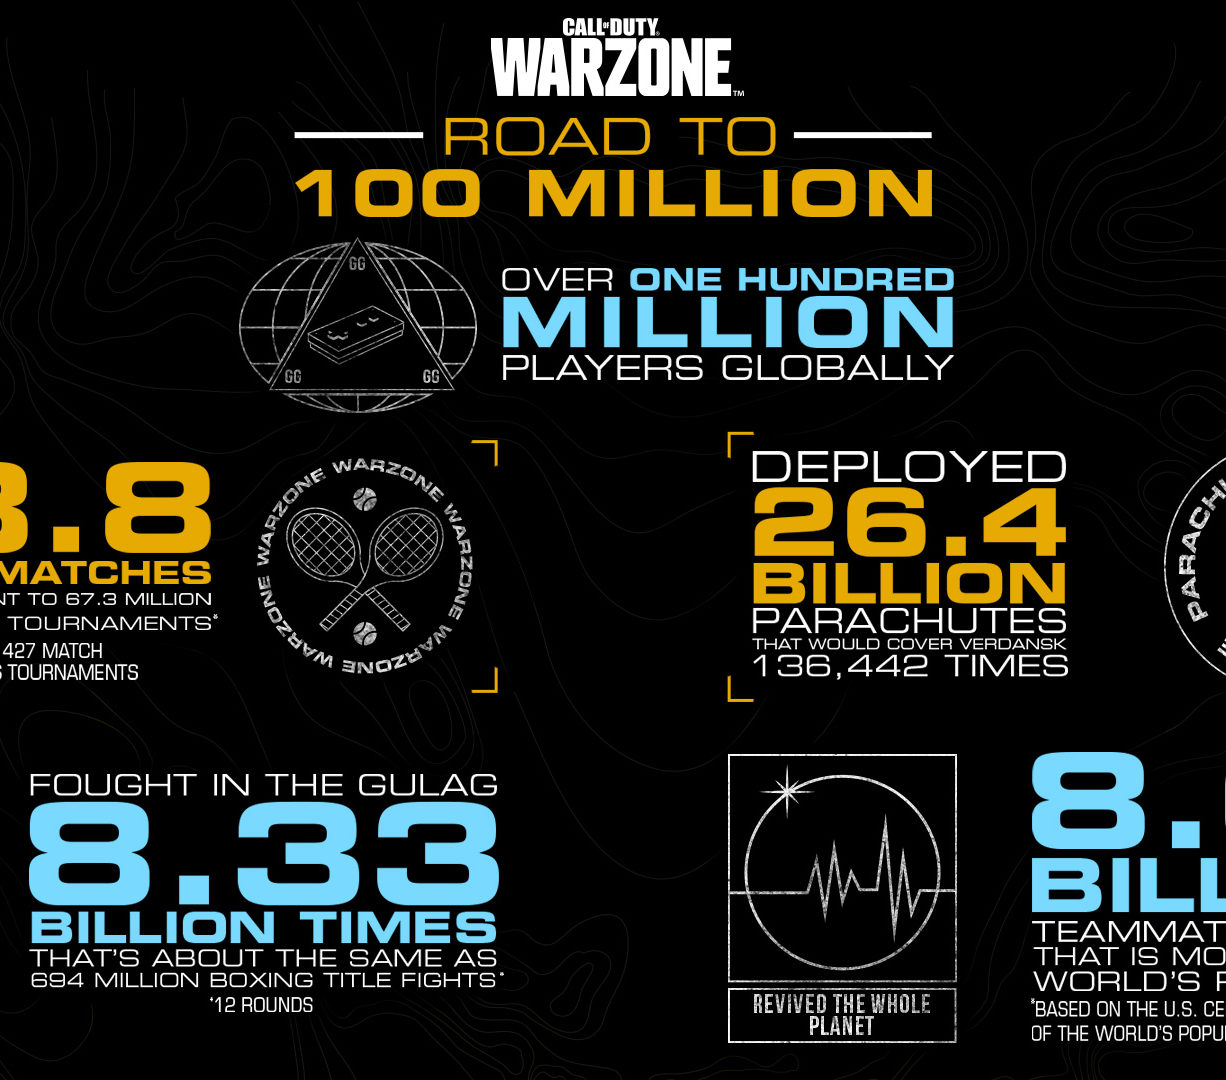 Call of duty warzone update season 3